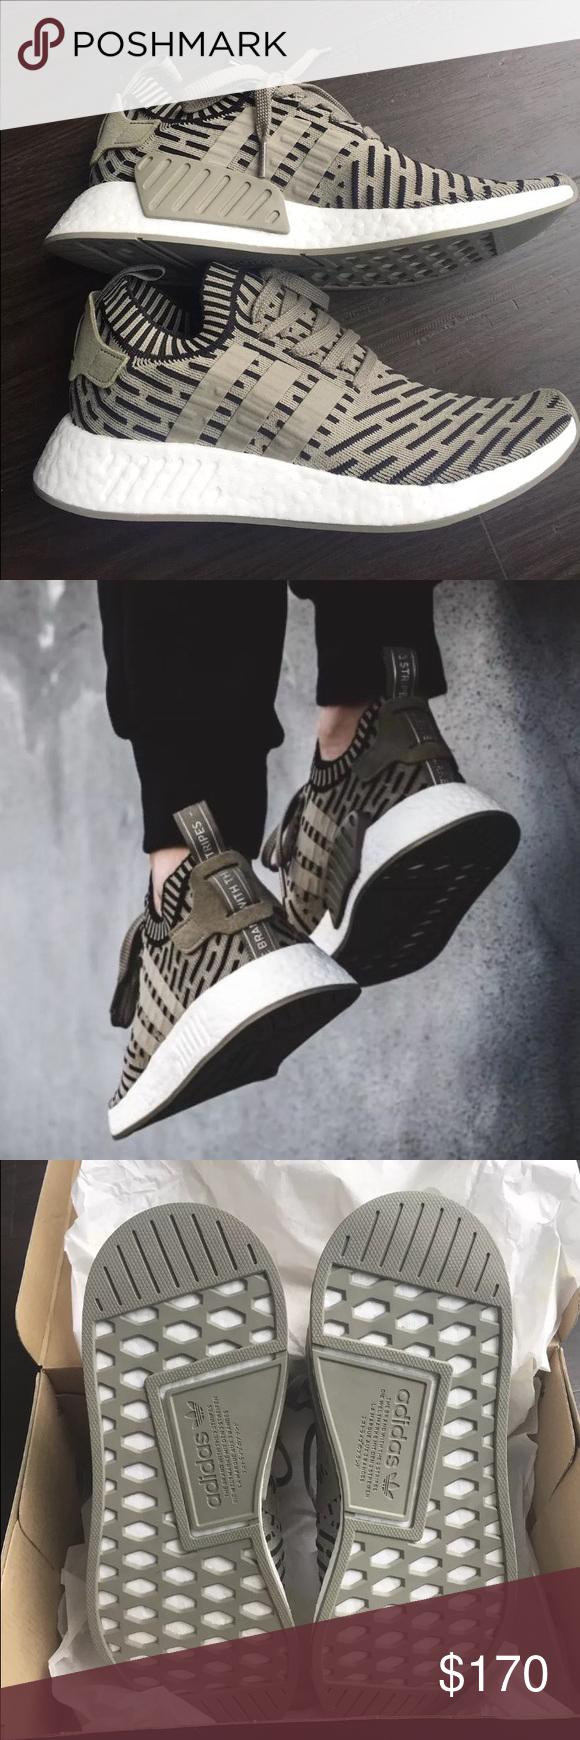 nwb adidas nmd r2 primeknit scarpe uomini '10 ba7198 nwt adidas nmd